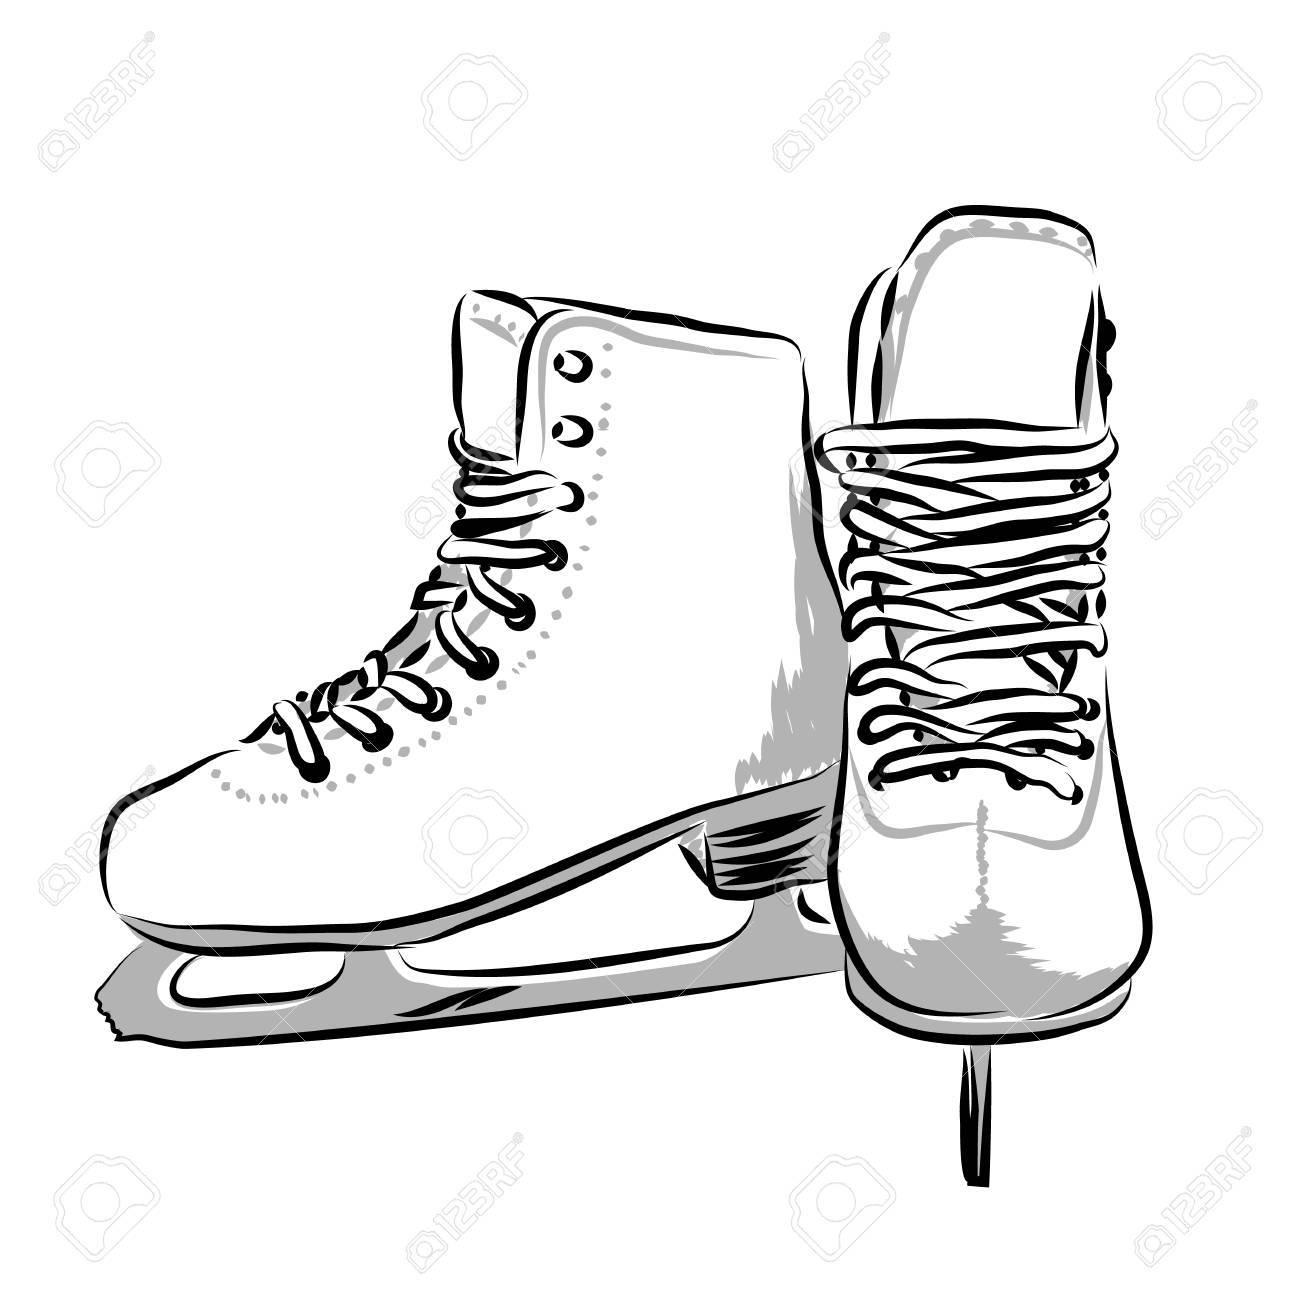 Ice Skate Drawing.